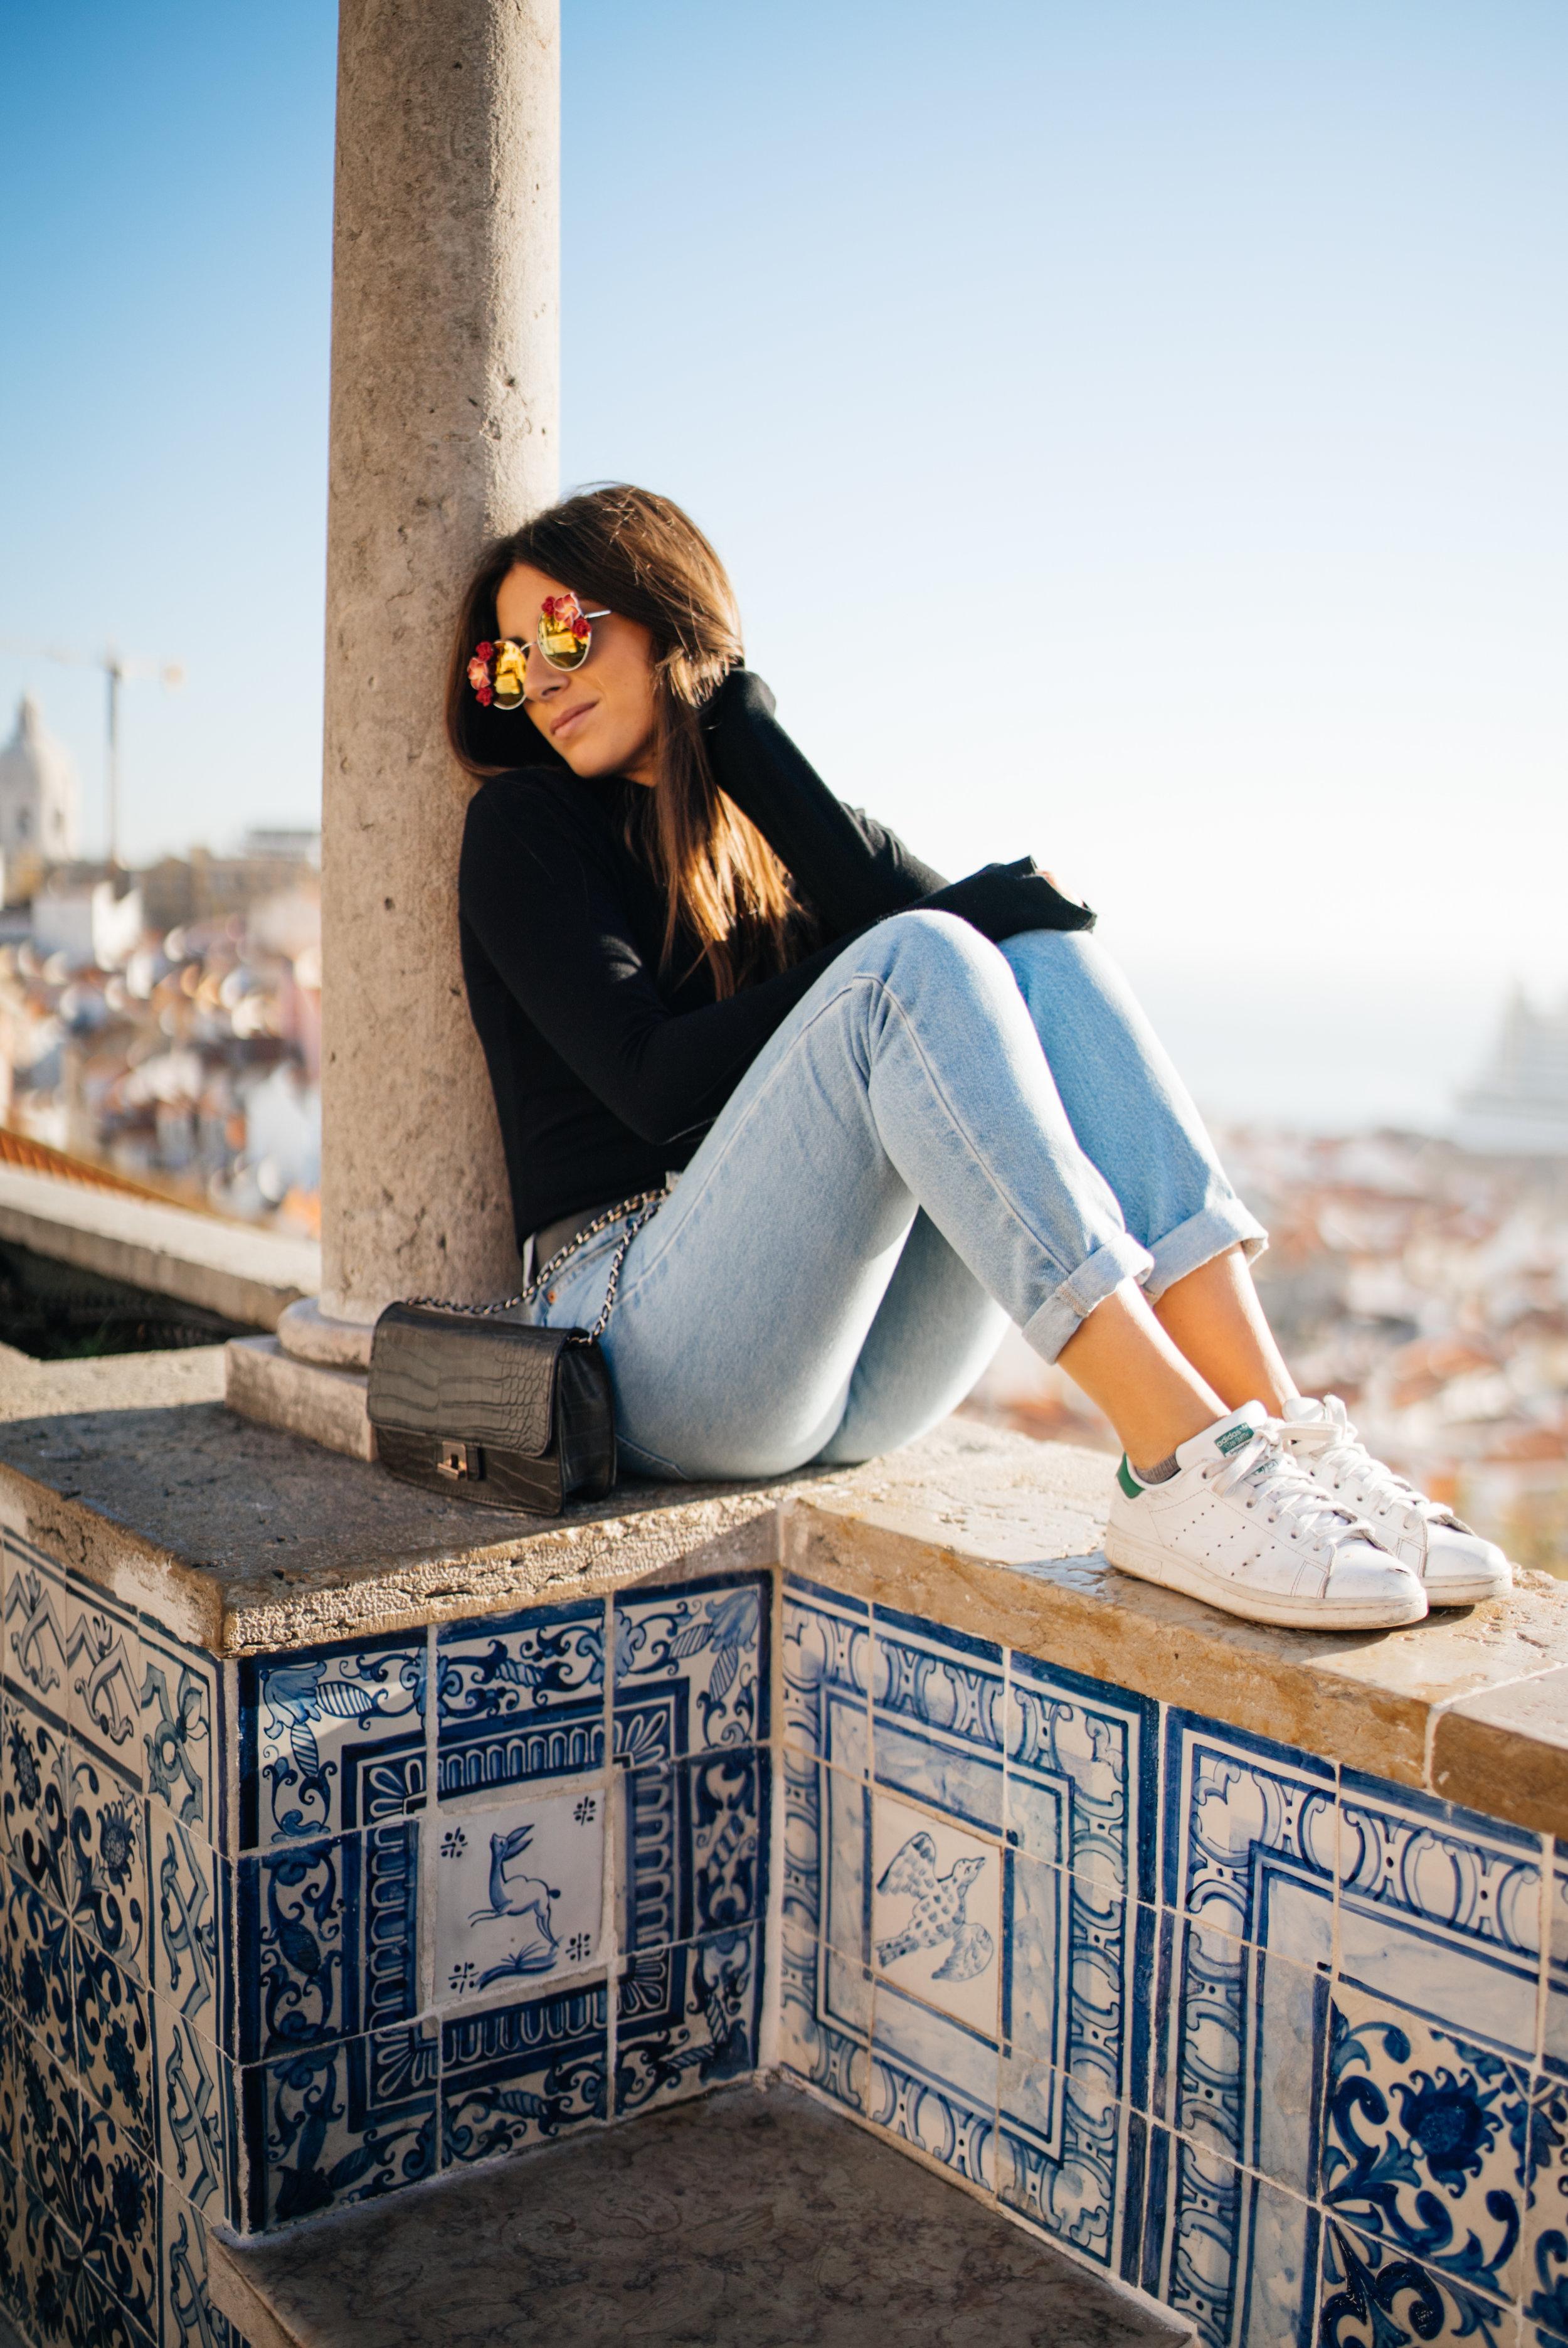 Lisboa-escape-DSTN-Paquerettes-3.jpg